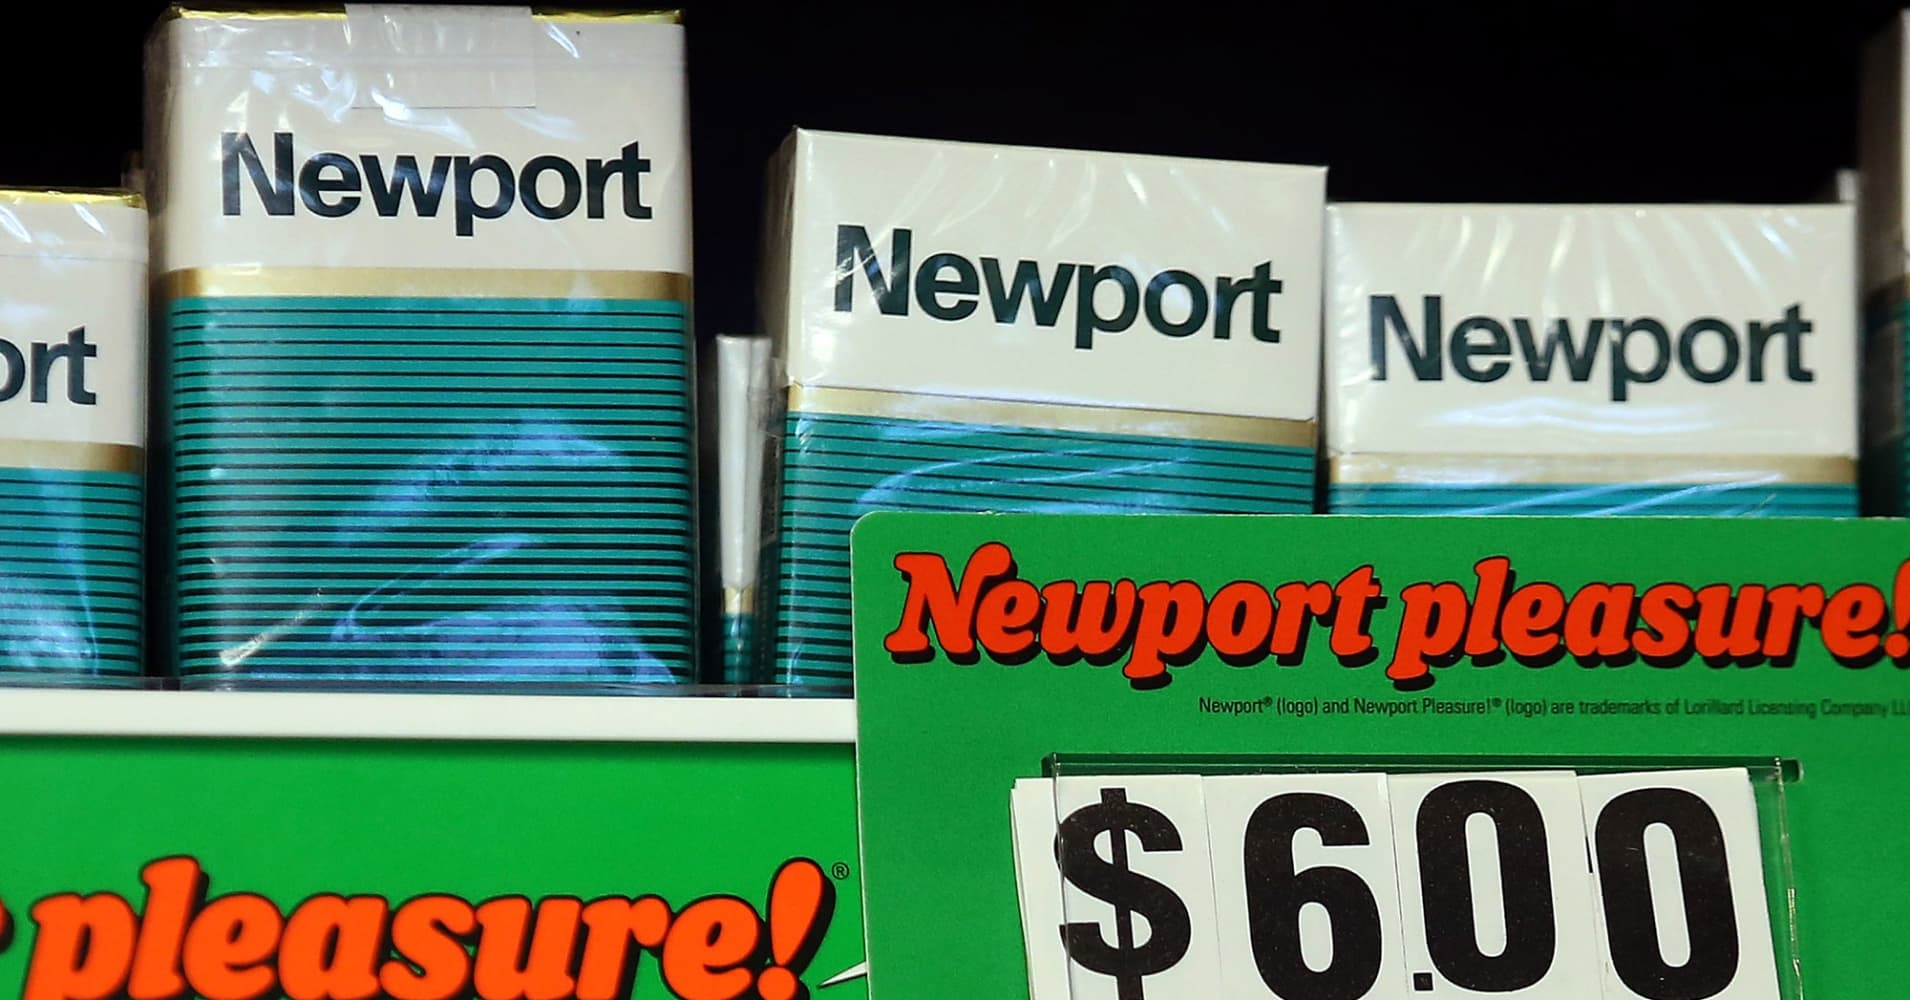 San Francisco to vote on menthol cigarettes and e-cigarette flavors ban